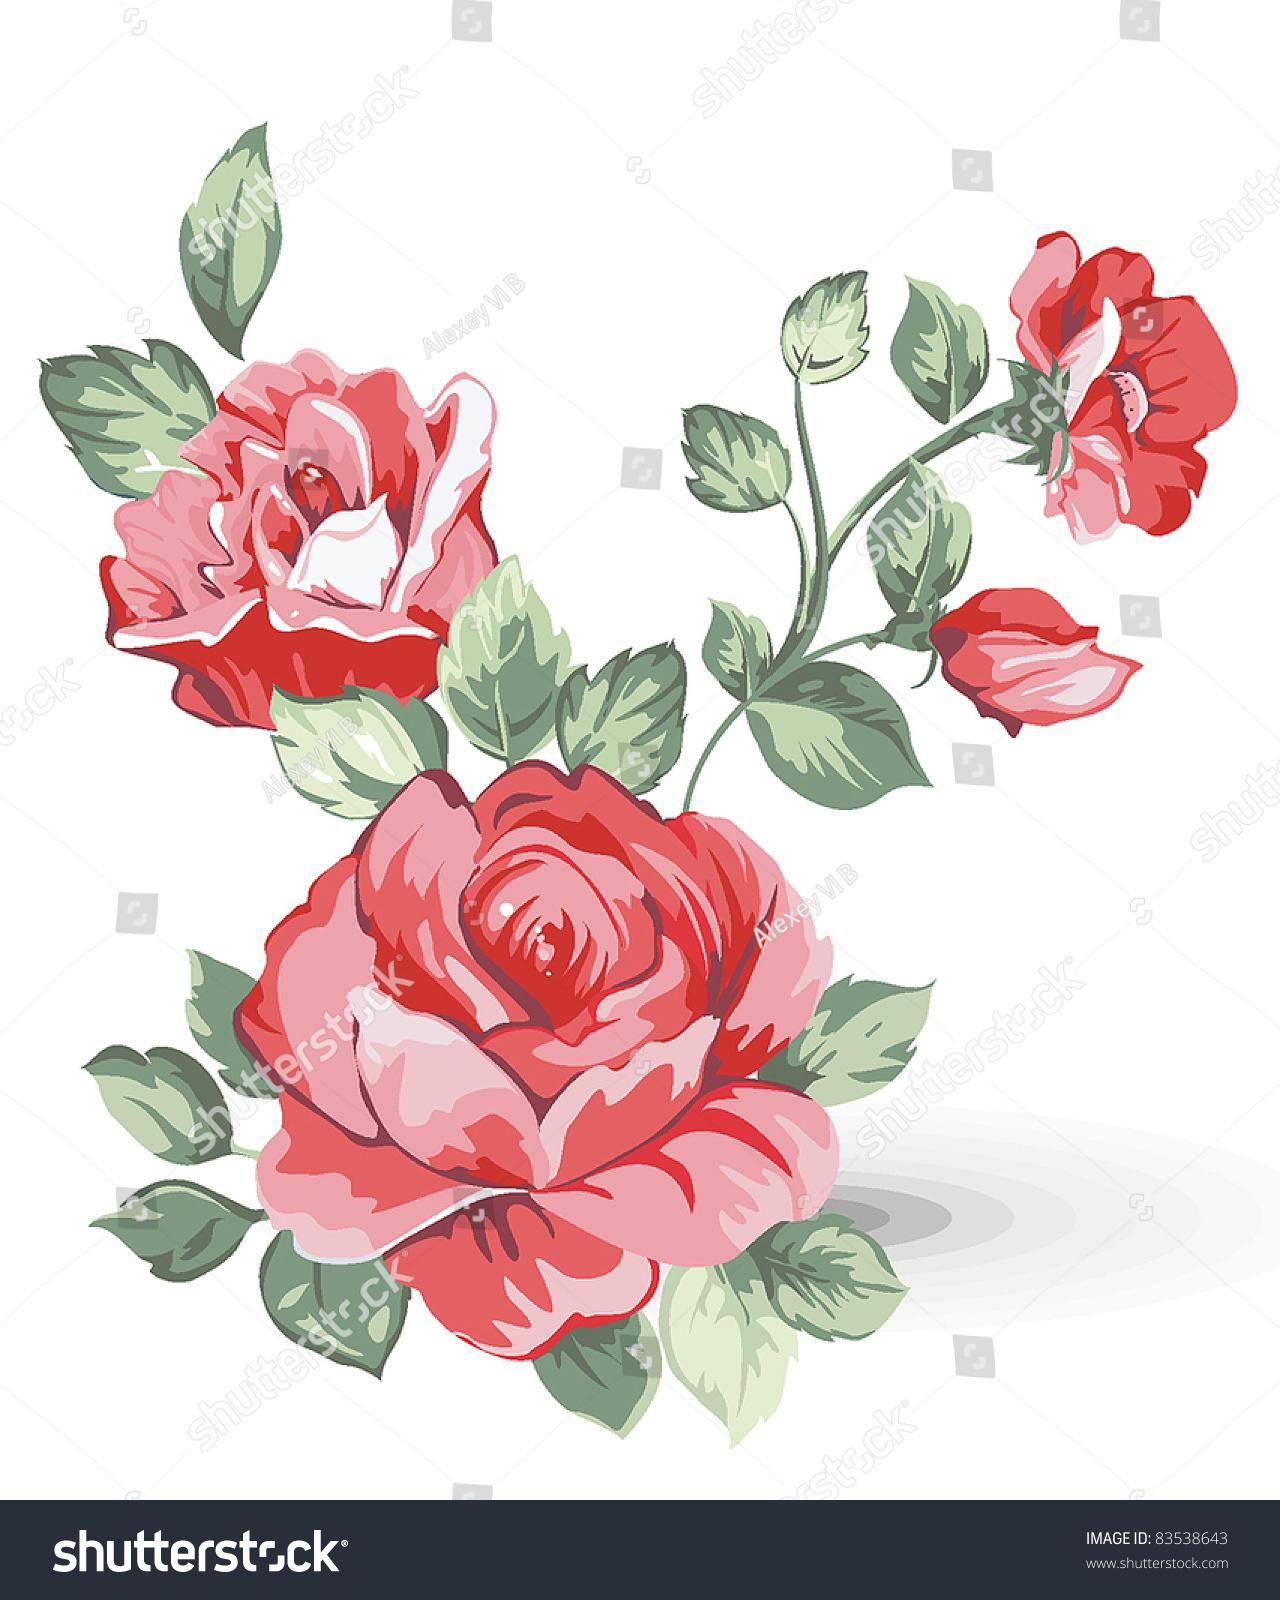 Elegance Illustration Pink Flowers Bouquet Isolated Stock Photo ...